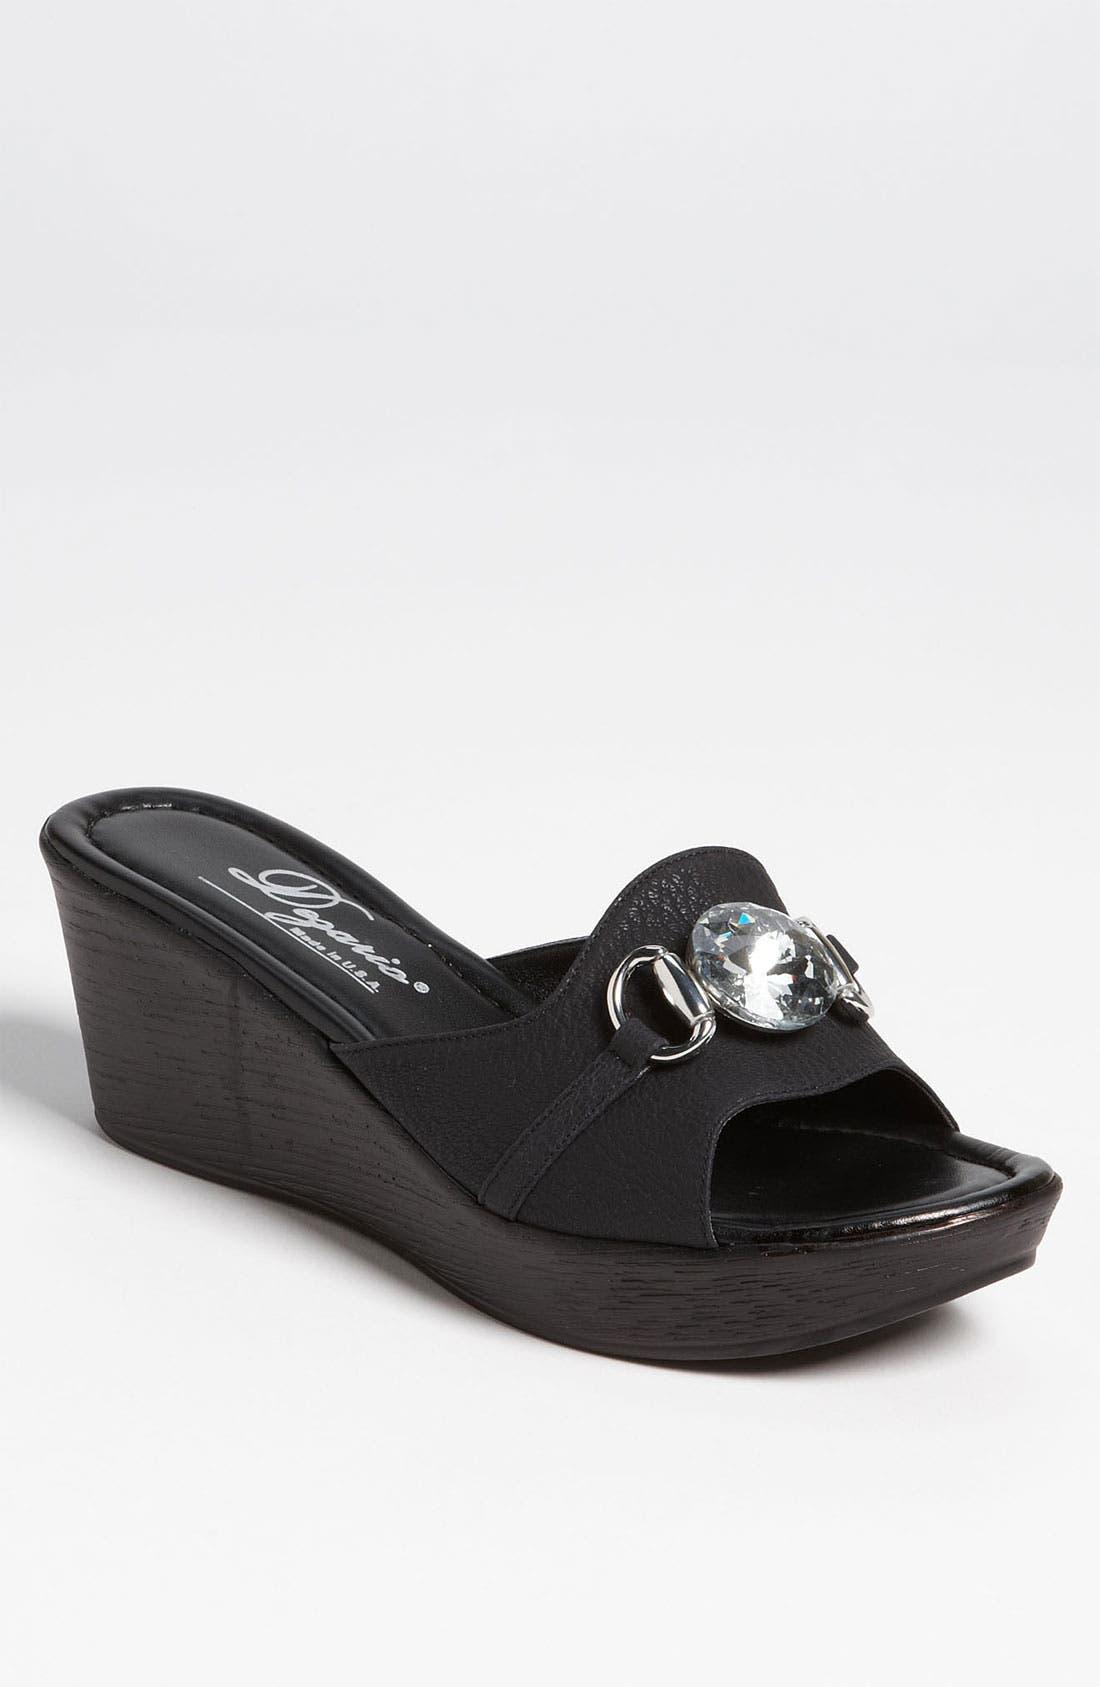 Alternate Image 1 Selected - Dezario 'Mode' Sandal